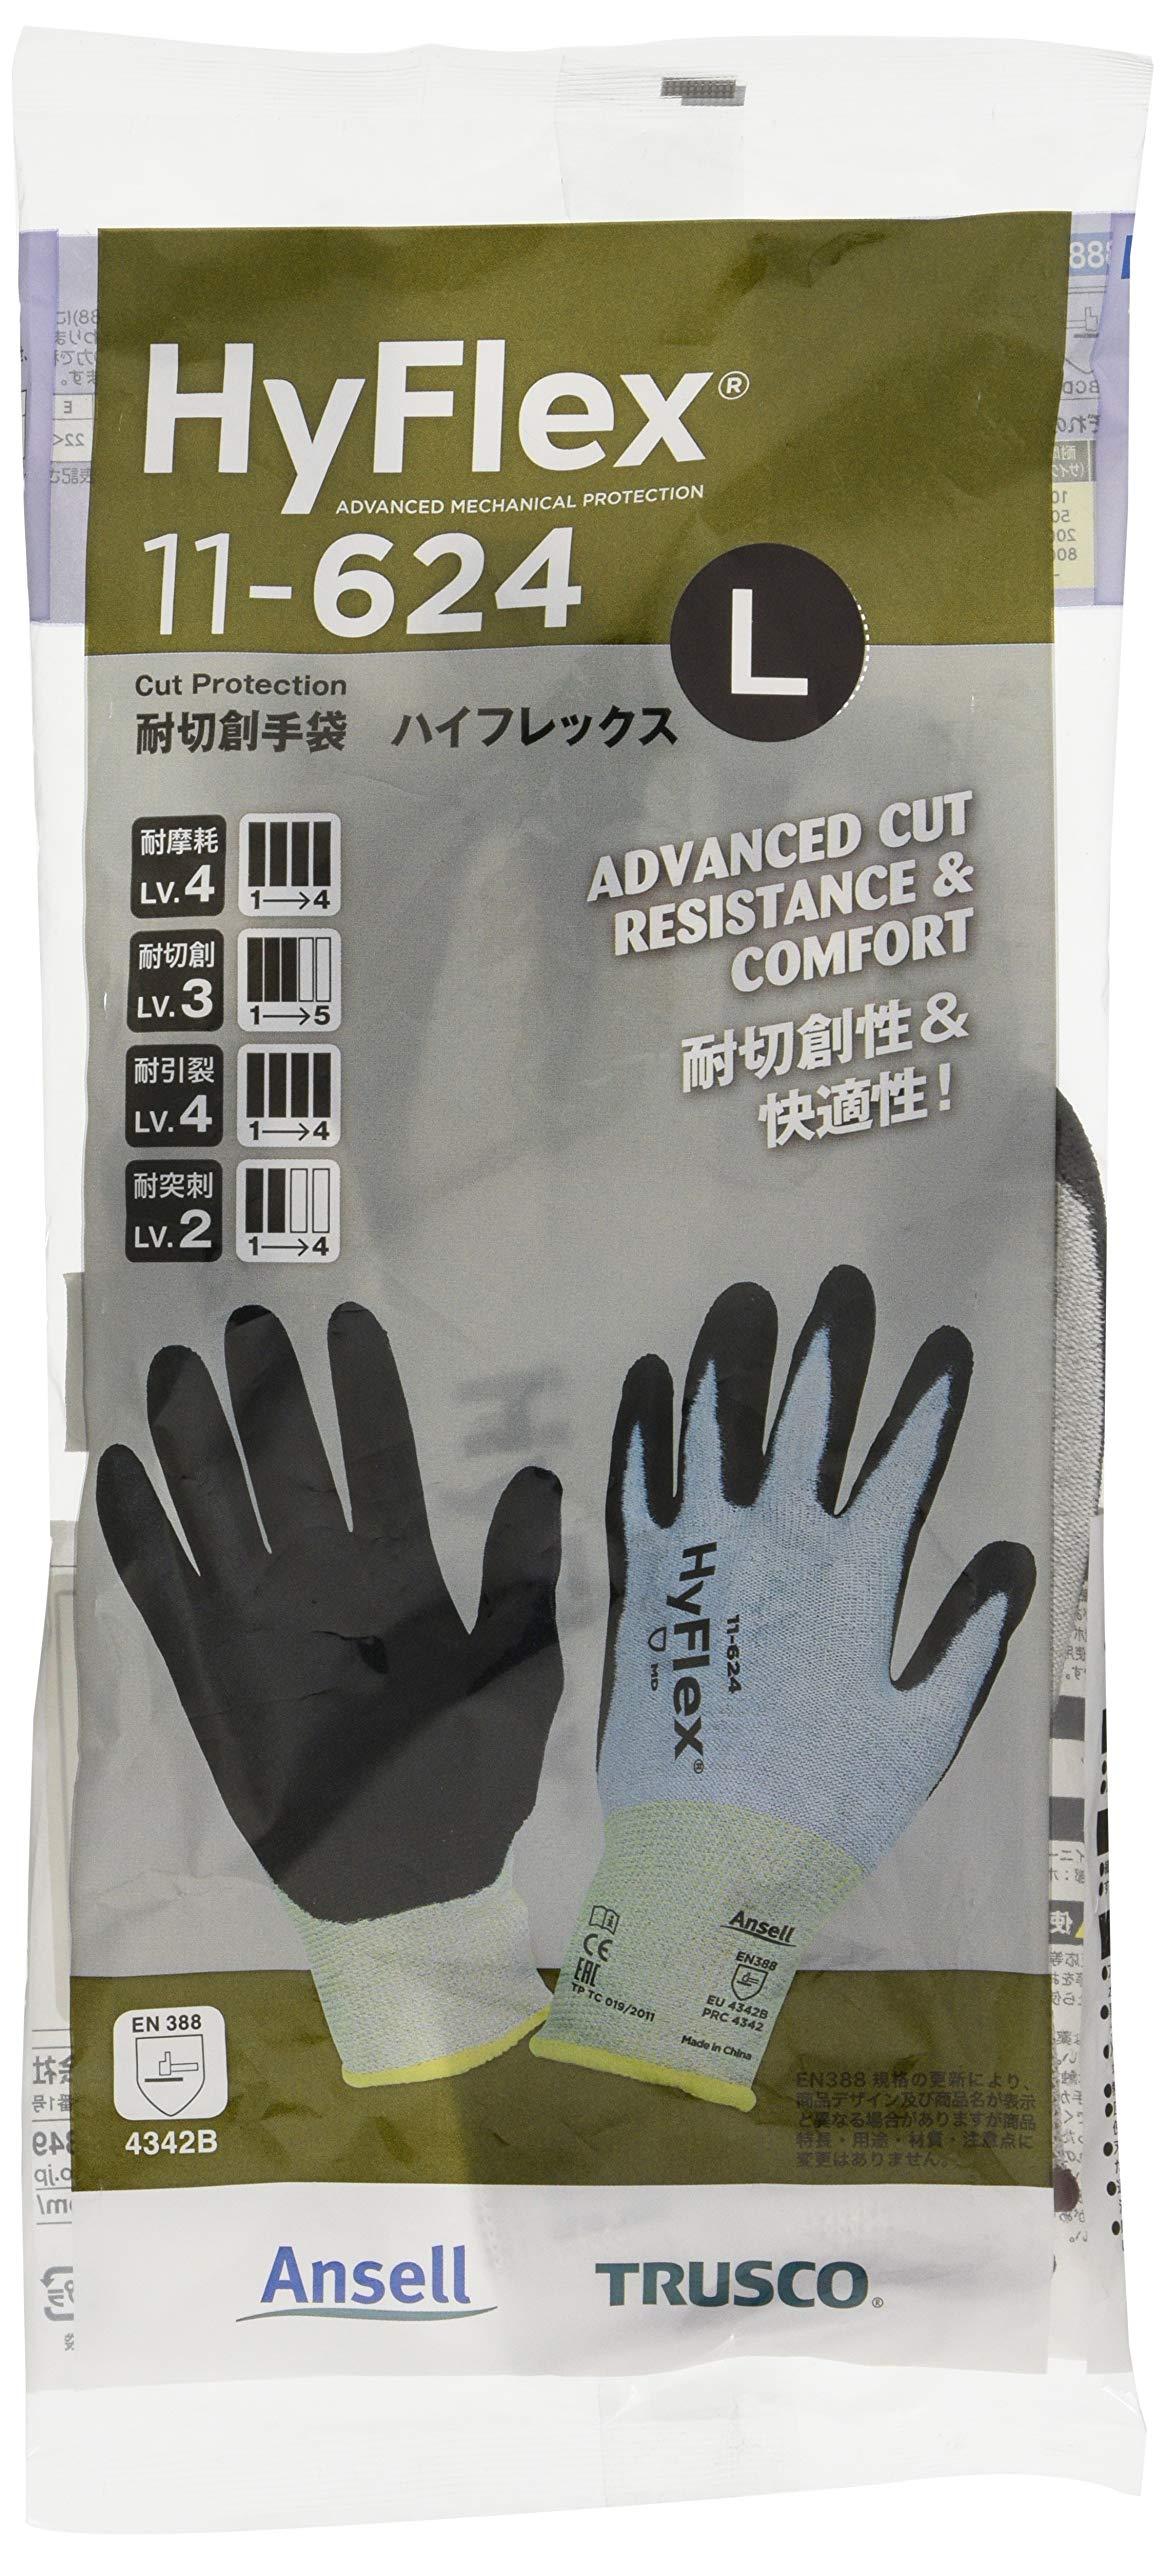 9 HyFlex® Spandex And Nylon Gloves With Black Polyurethane Palm Dip And DSM Dyneema® Lining